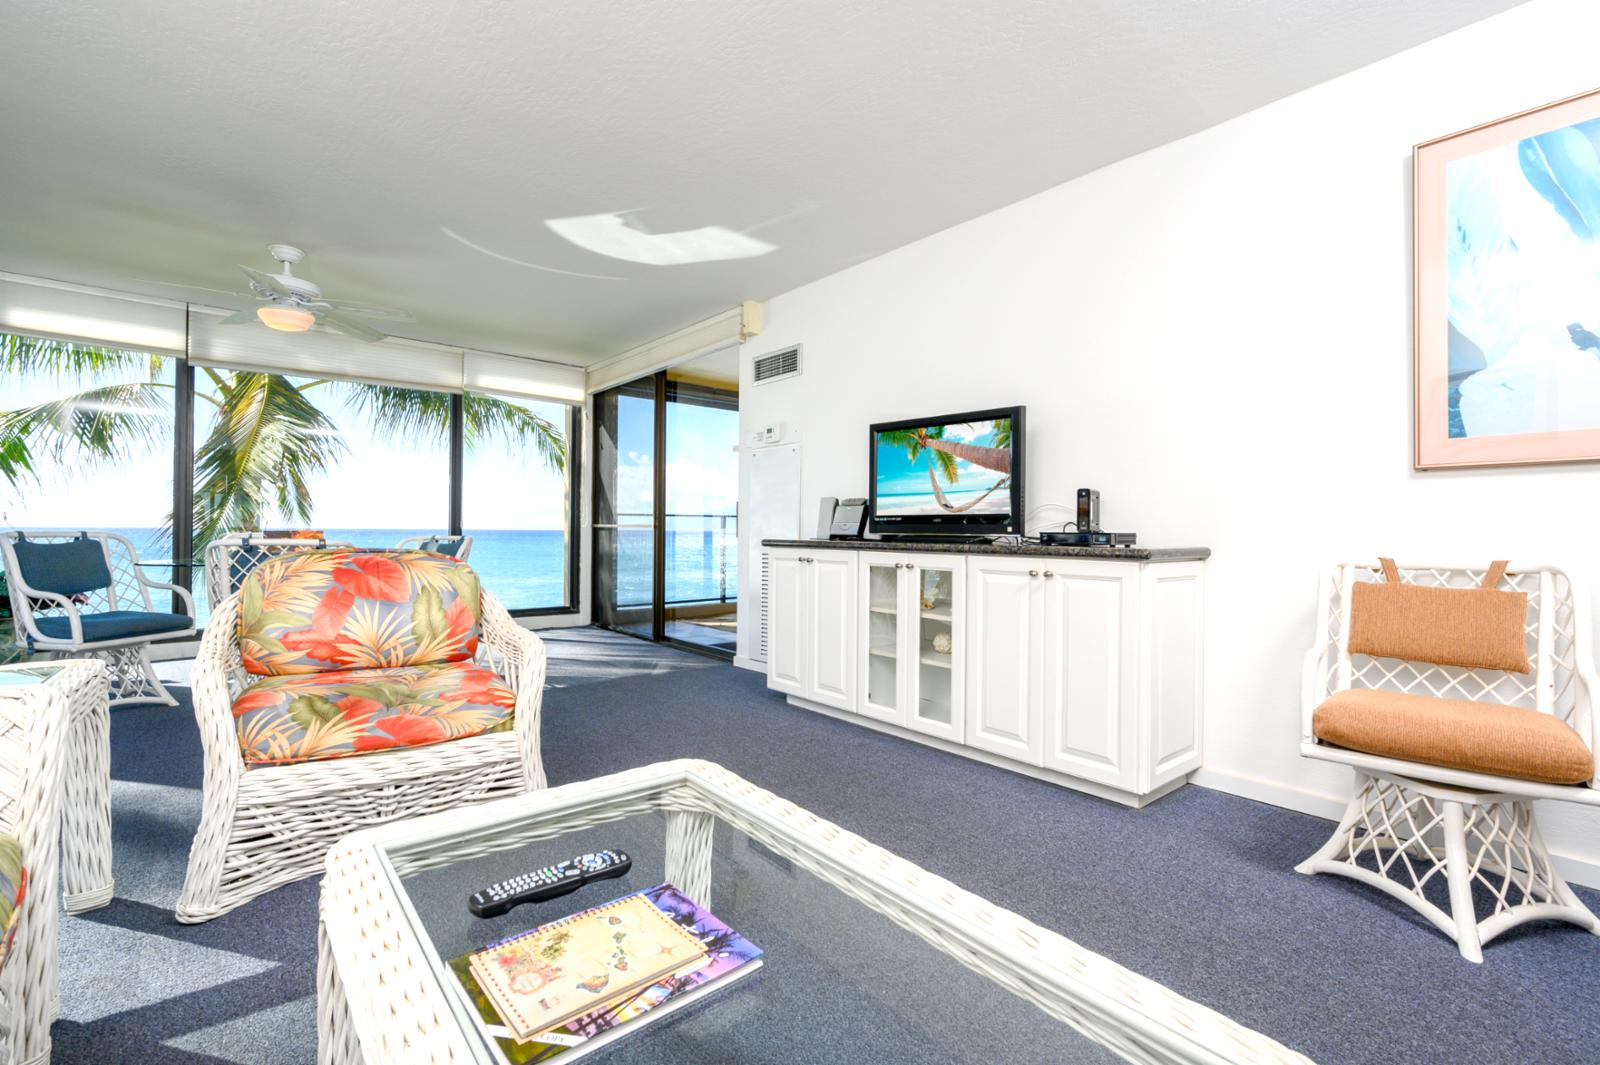 Beach chic interiors and authentic Hawaiiana artwork